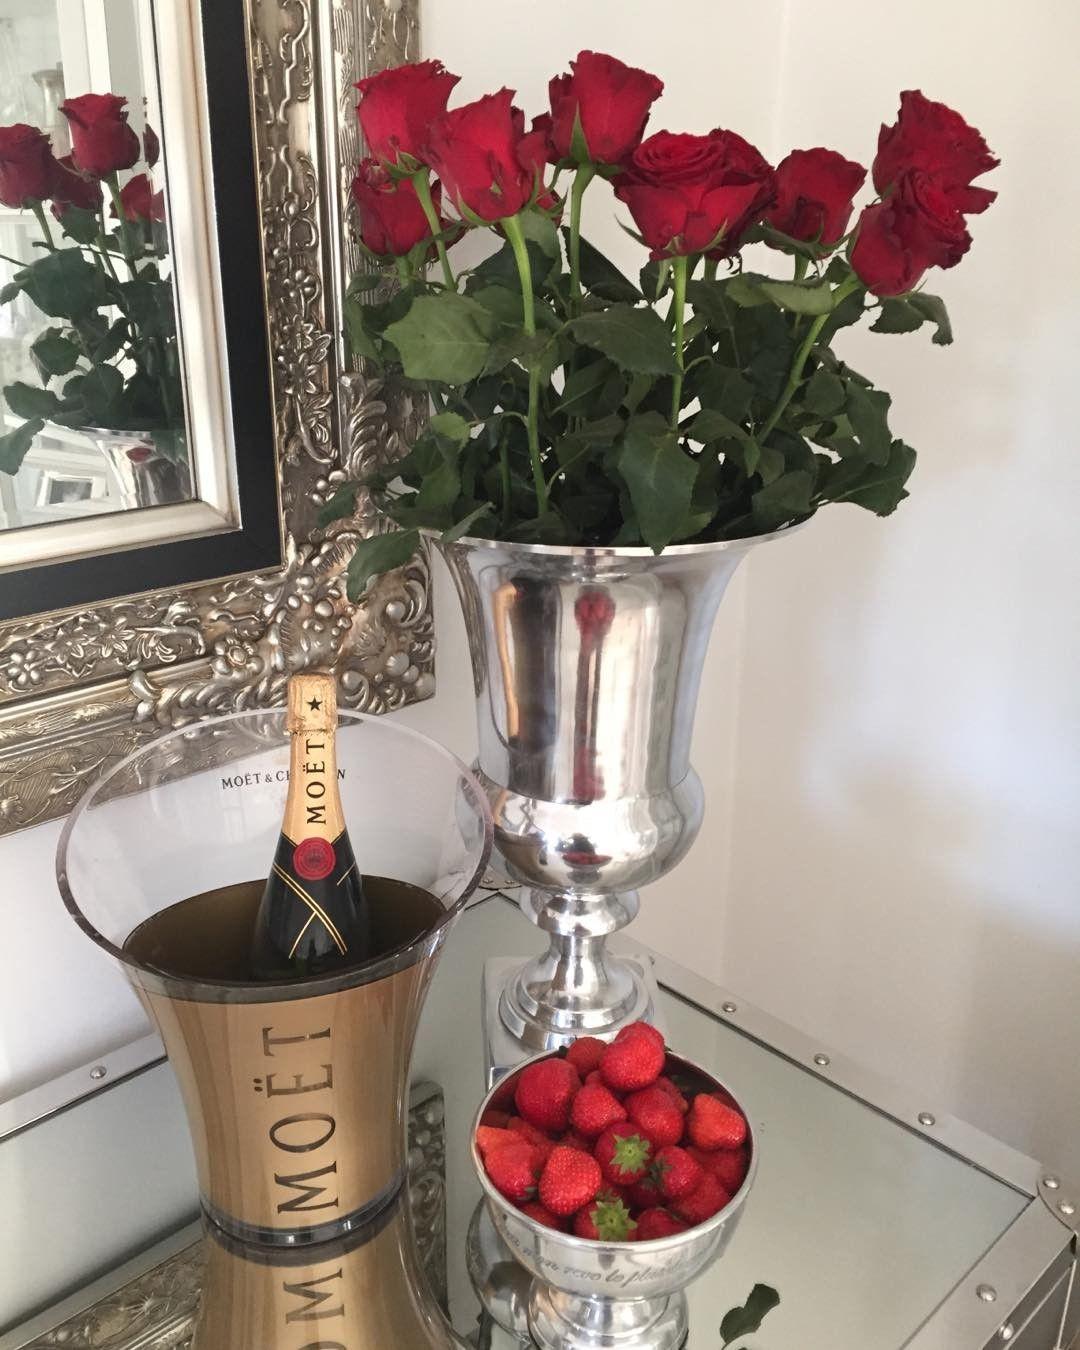 Lørdag  #classicliving #moet #champagne #jordbær  #interiorforyou #interior123 #interiordecorating # #homedesign #glam #classichomes #interiorlovers #style #livingroom #interior4all #me #you #roominterior #vakrehjem #nordiskehjem #nordicinspiration #boligpluss #bobedre #skandenaviskehjem #finahem